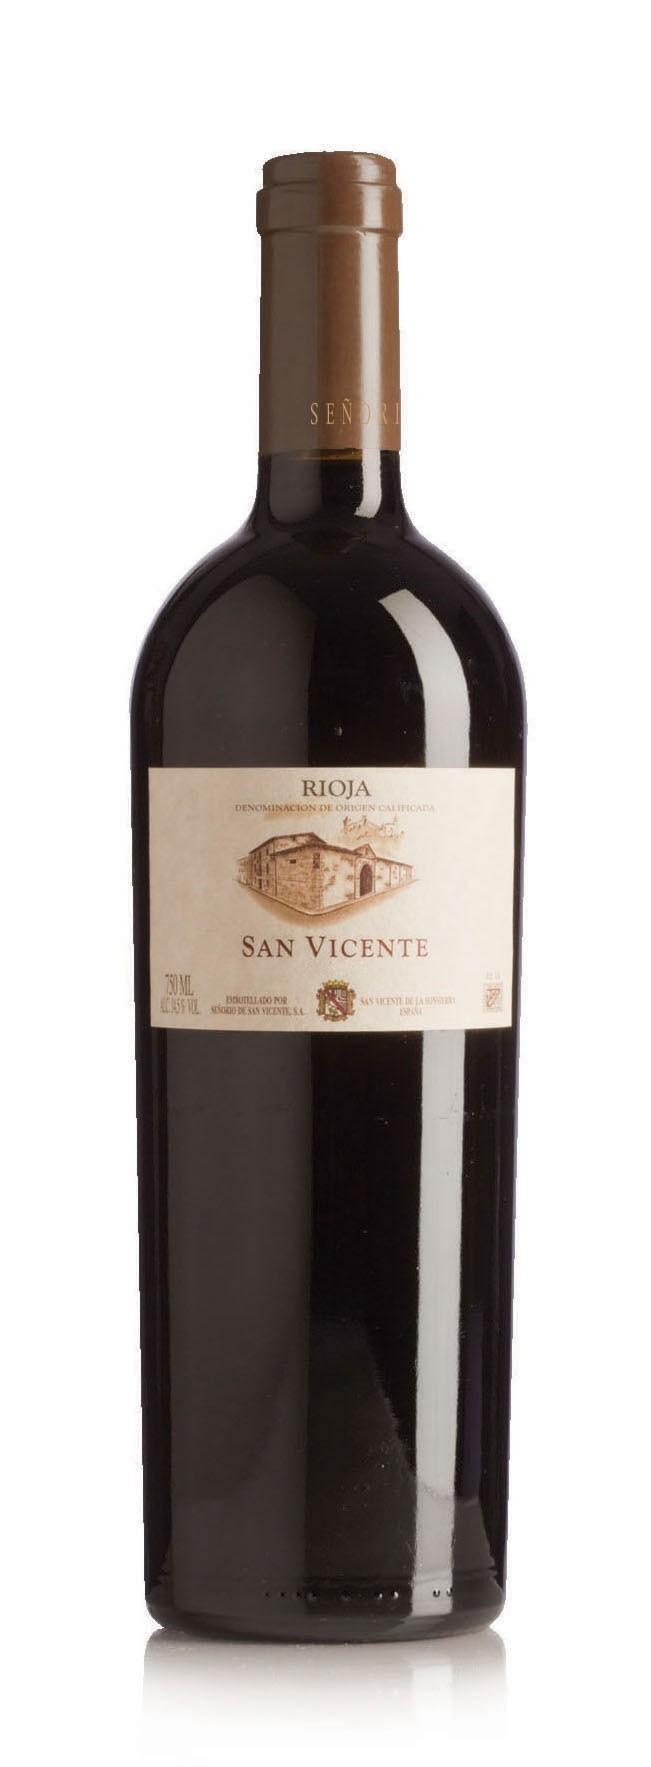 SEÑORÍO DE SAN VICENTE Rioja Single Vineyard, 2015